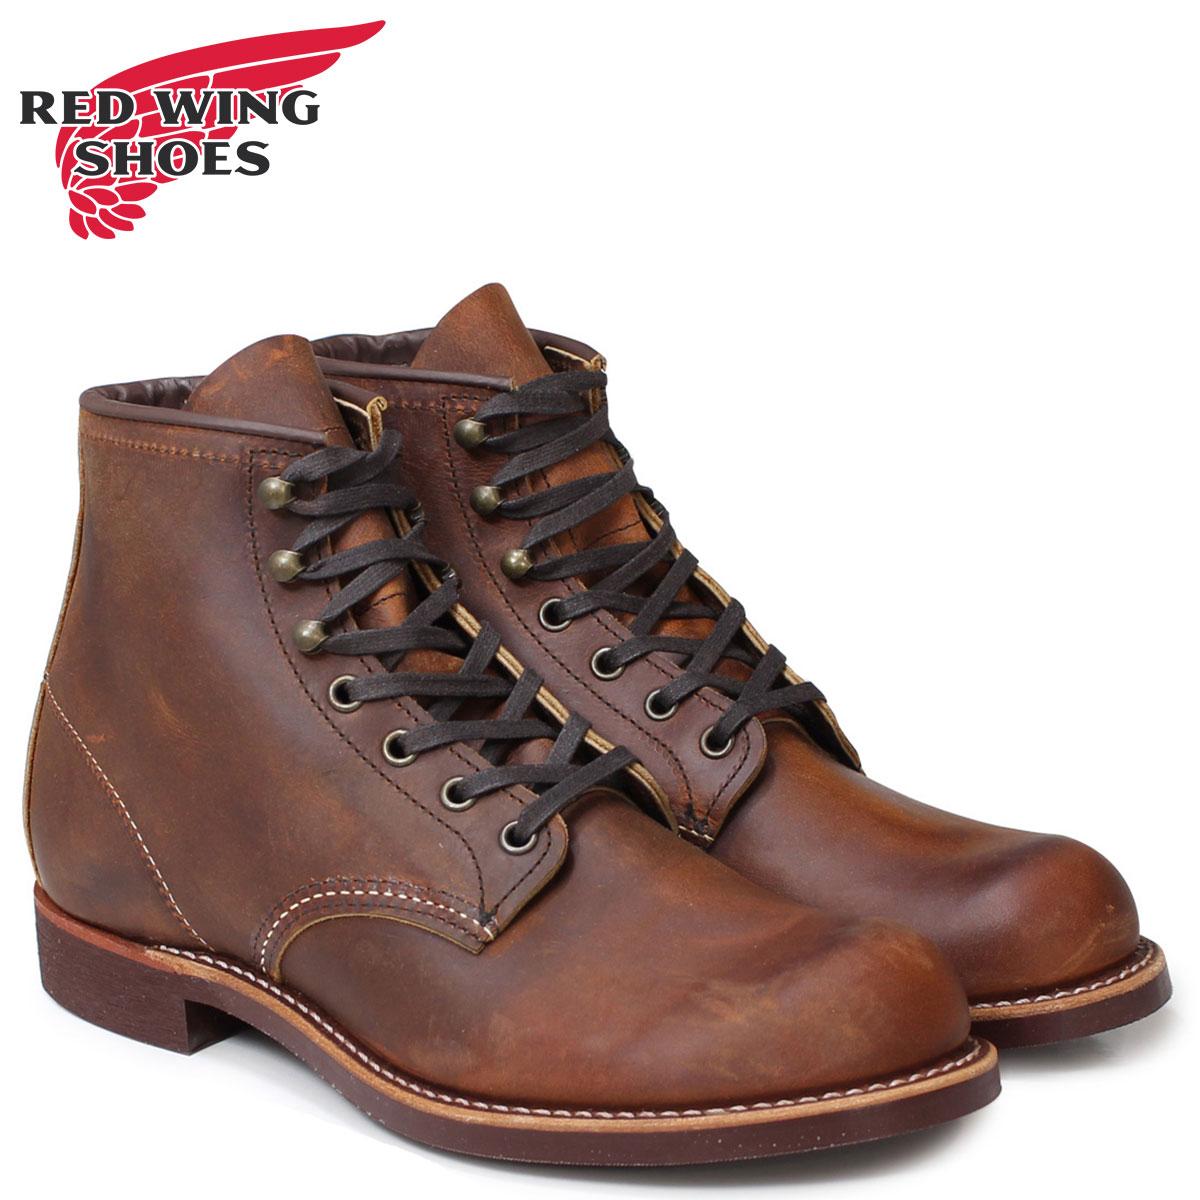 RED WING ROUGHNECK 6INCH BOOT レディース レッドウィング [1710] アイリッシュセッター アイリッシュセッターブーツ メンズ Dワイズ ブーツ 8146